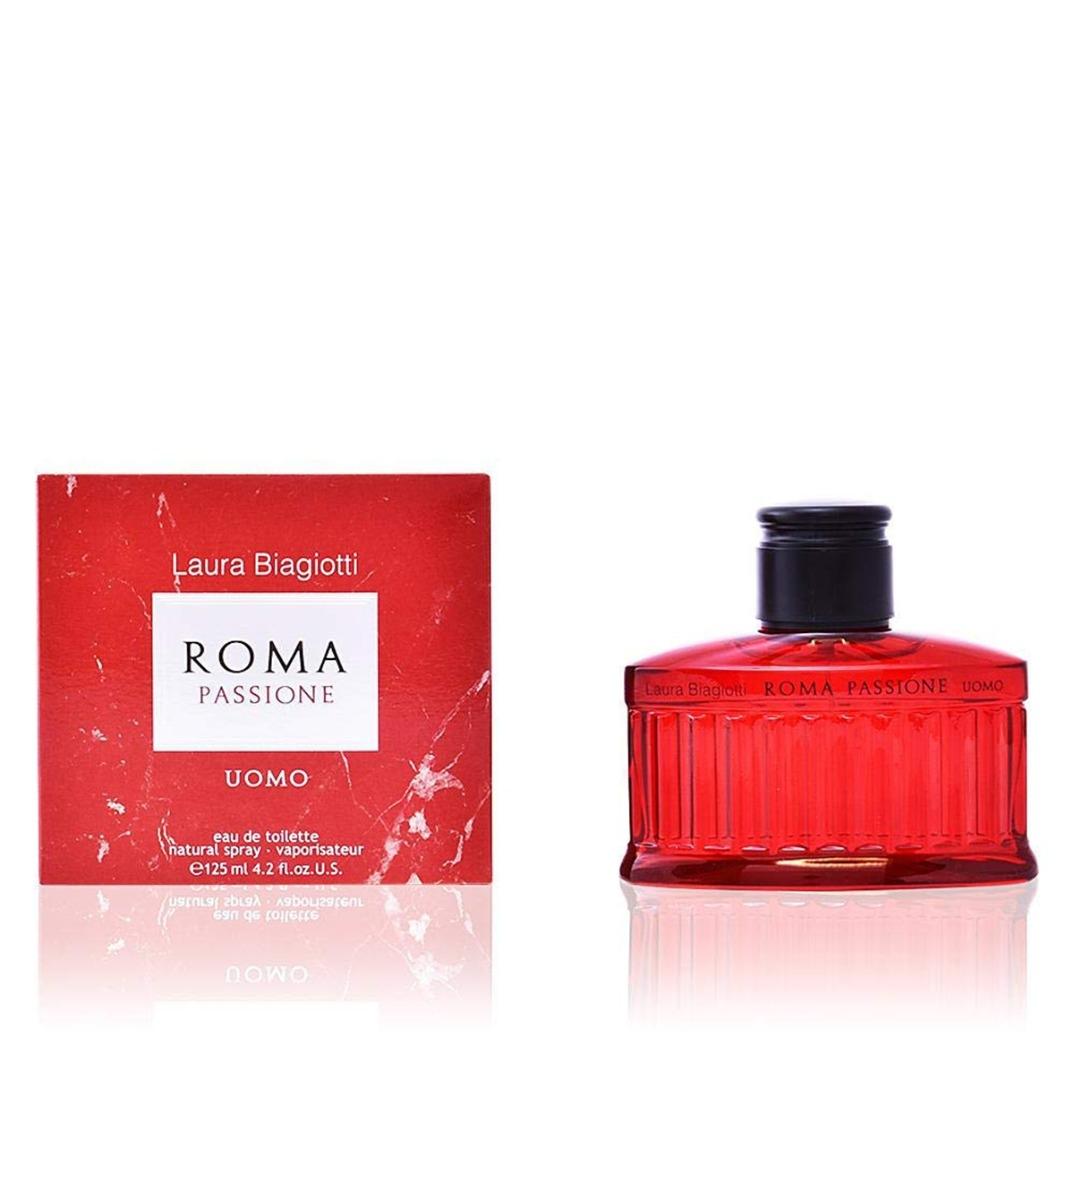 roma profumo uomo laura biagiotti